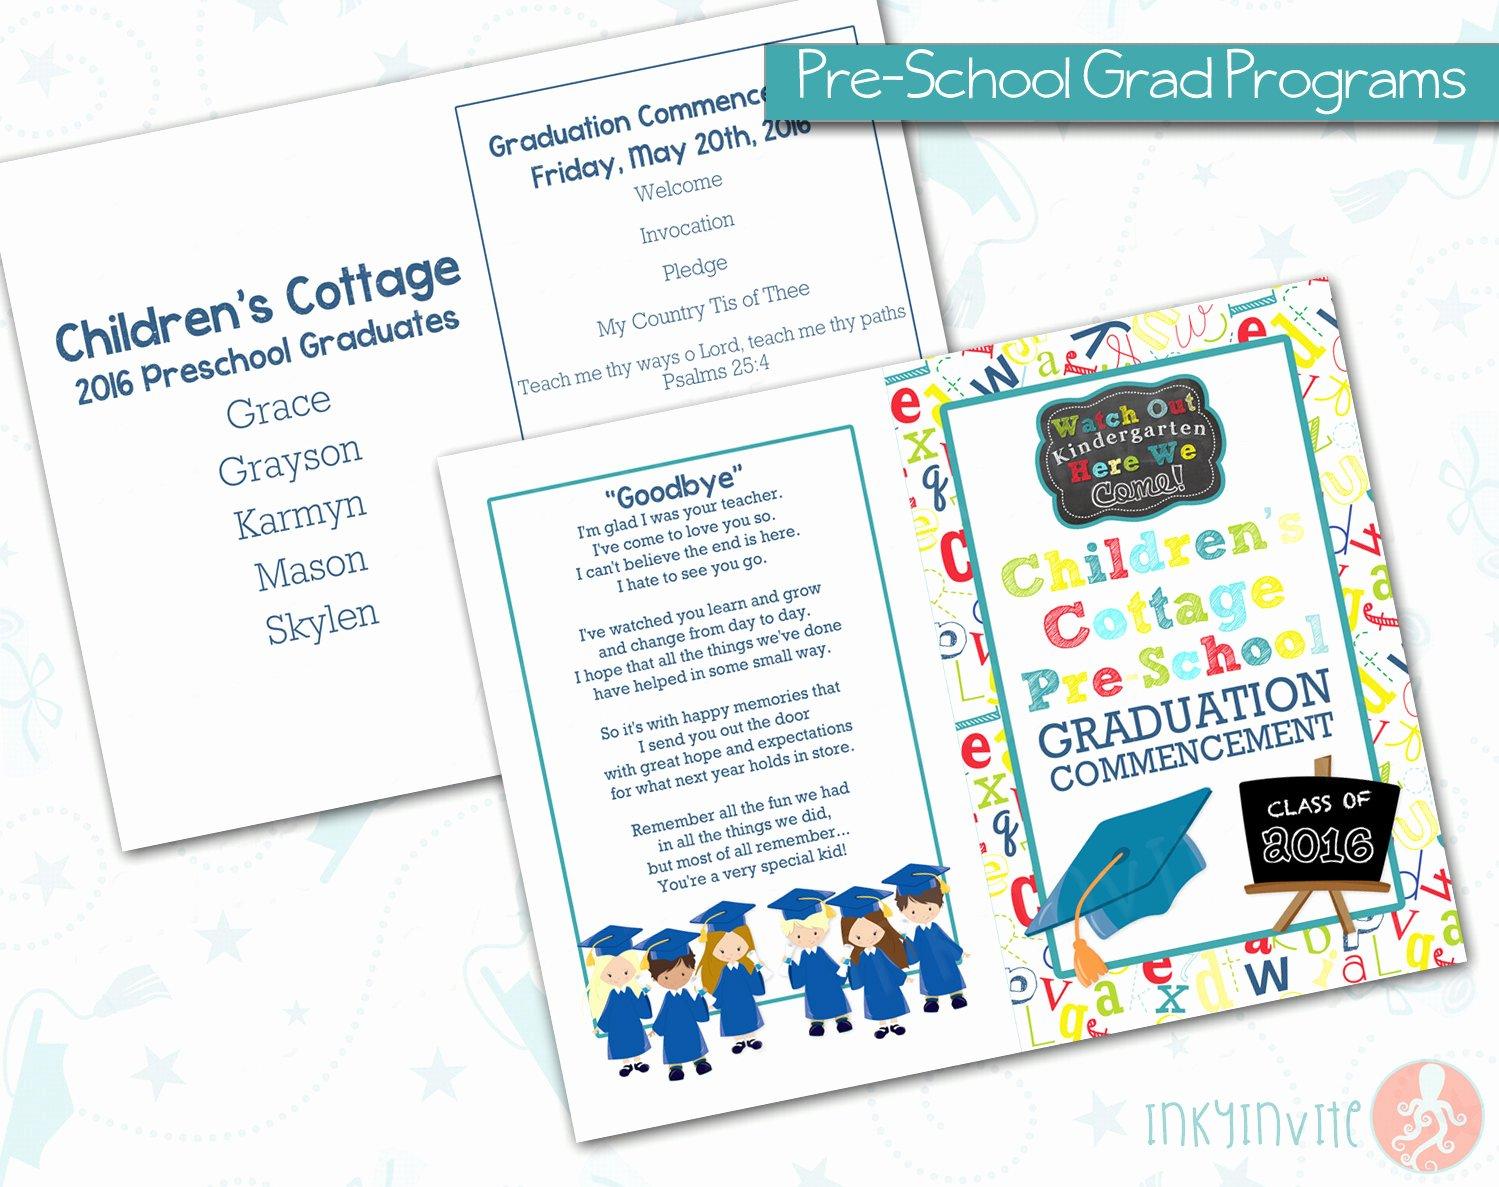 Graduation Ceremony Program Template Lovely Pre School Graduation Programs Pre K Class Graduation